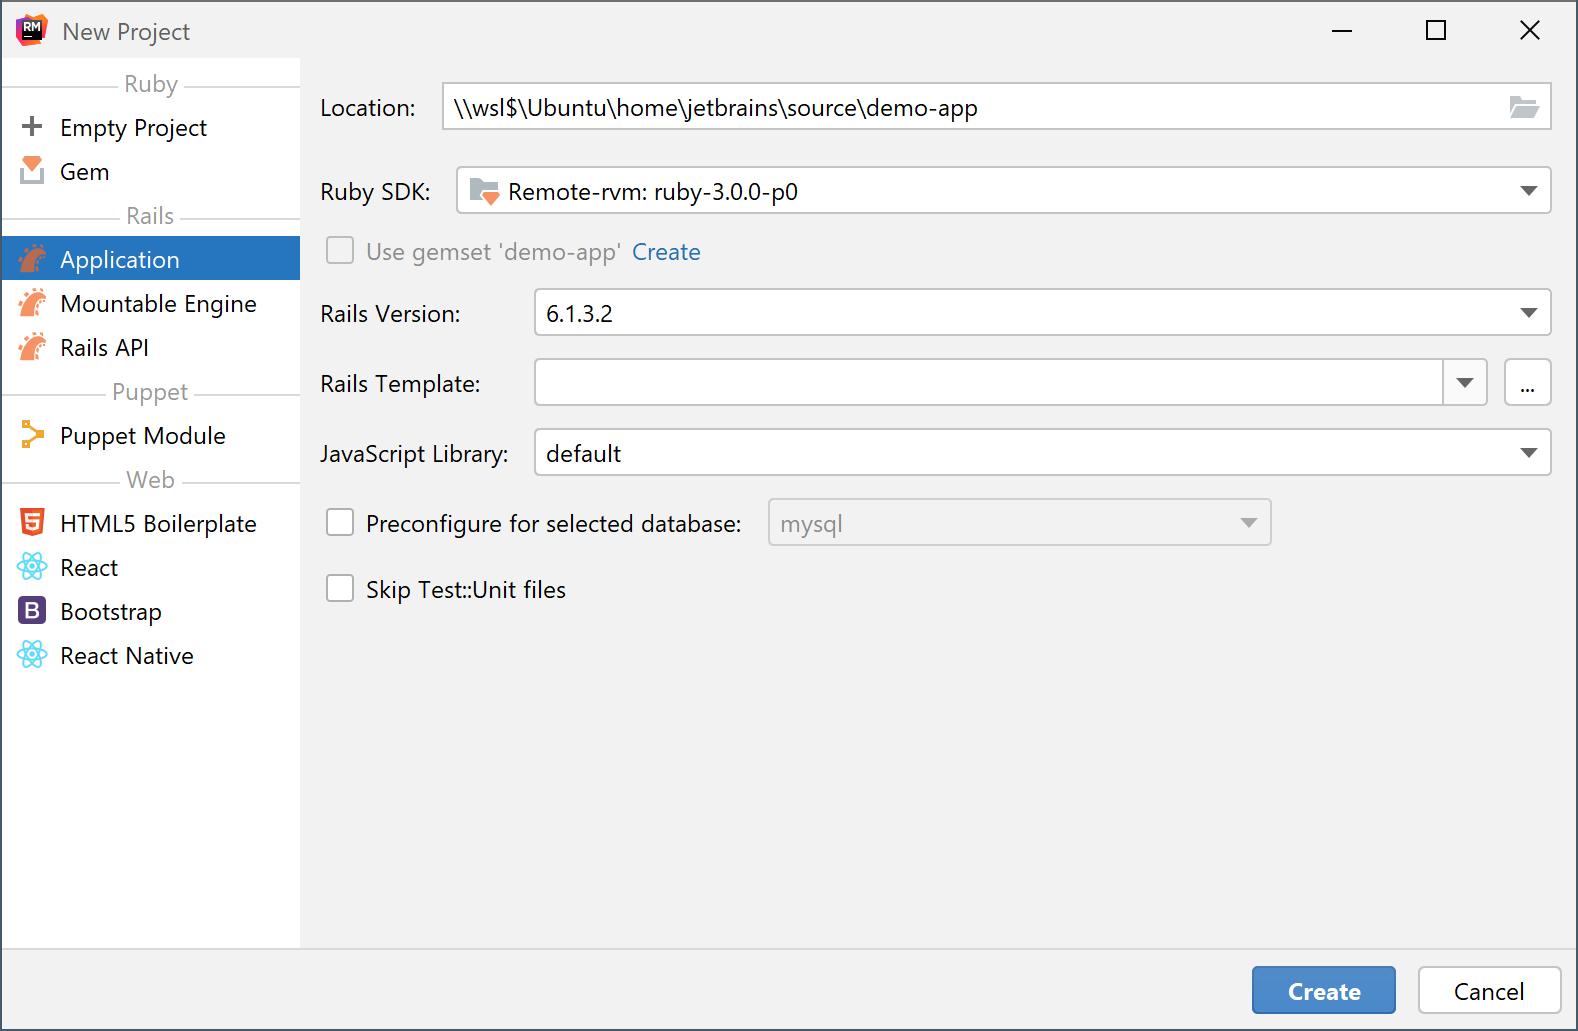 Create a project in WSL